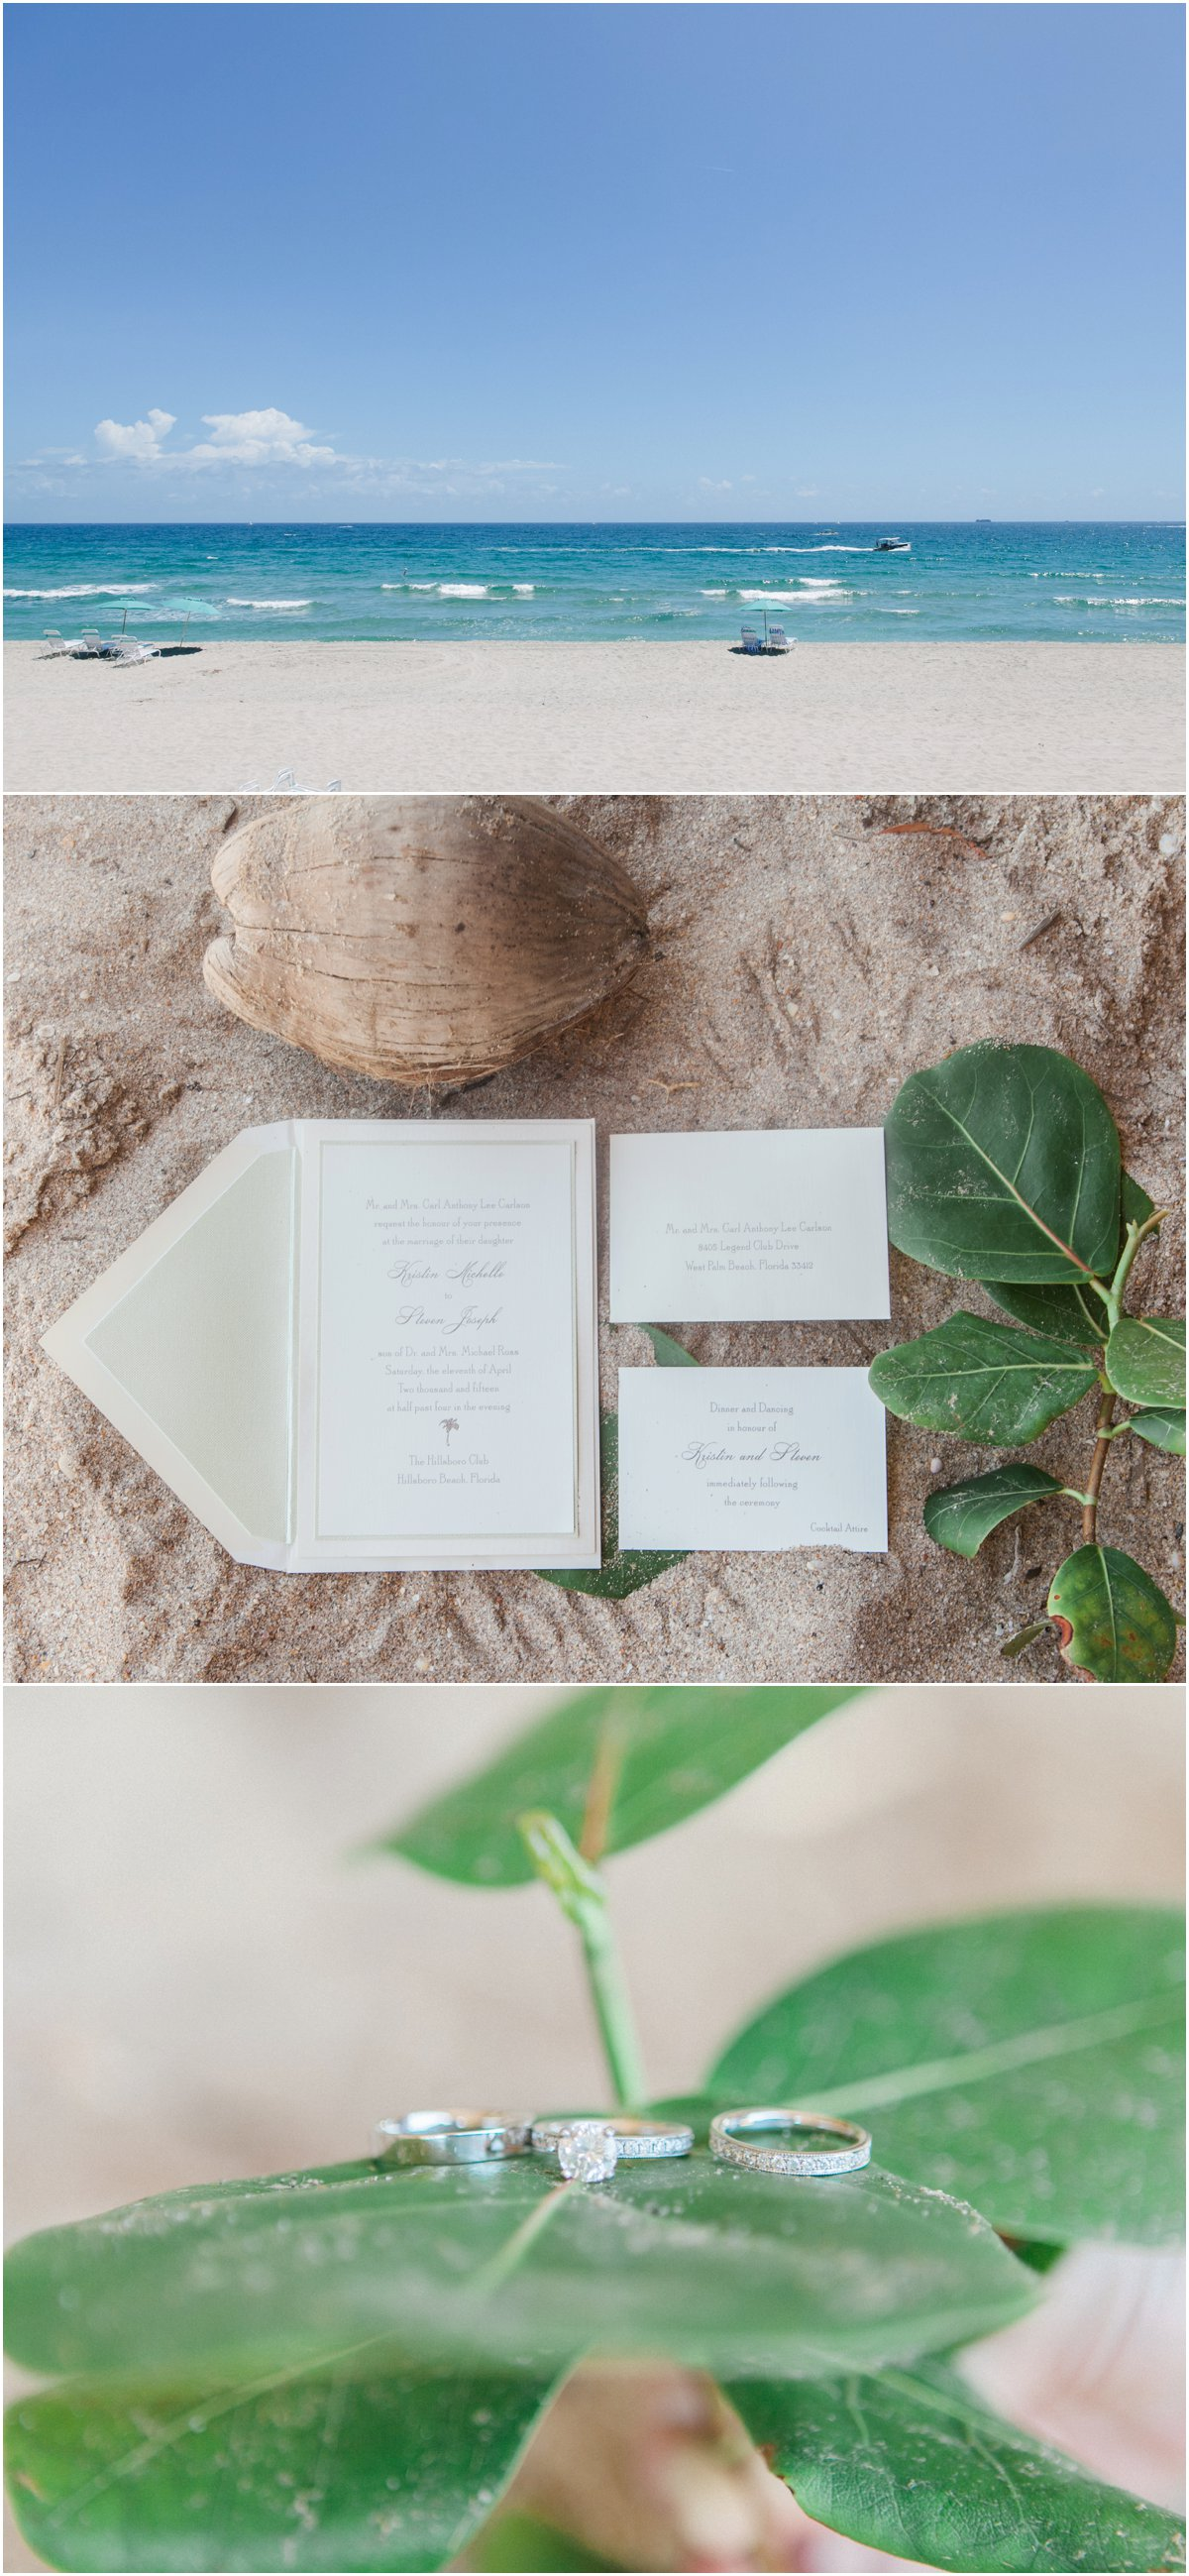 South-Florida-Wedding-Photographer-Hillsboro-lighthouse_0001